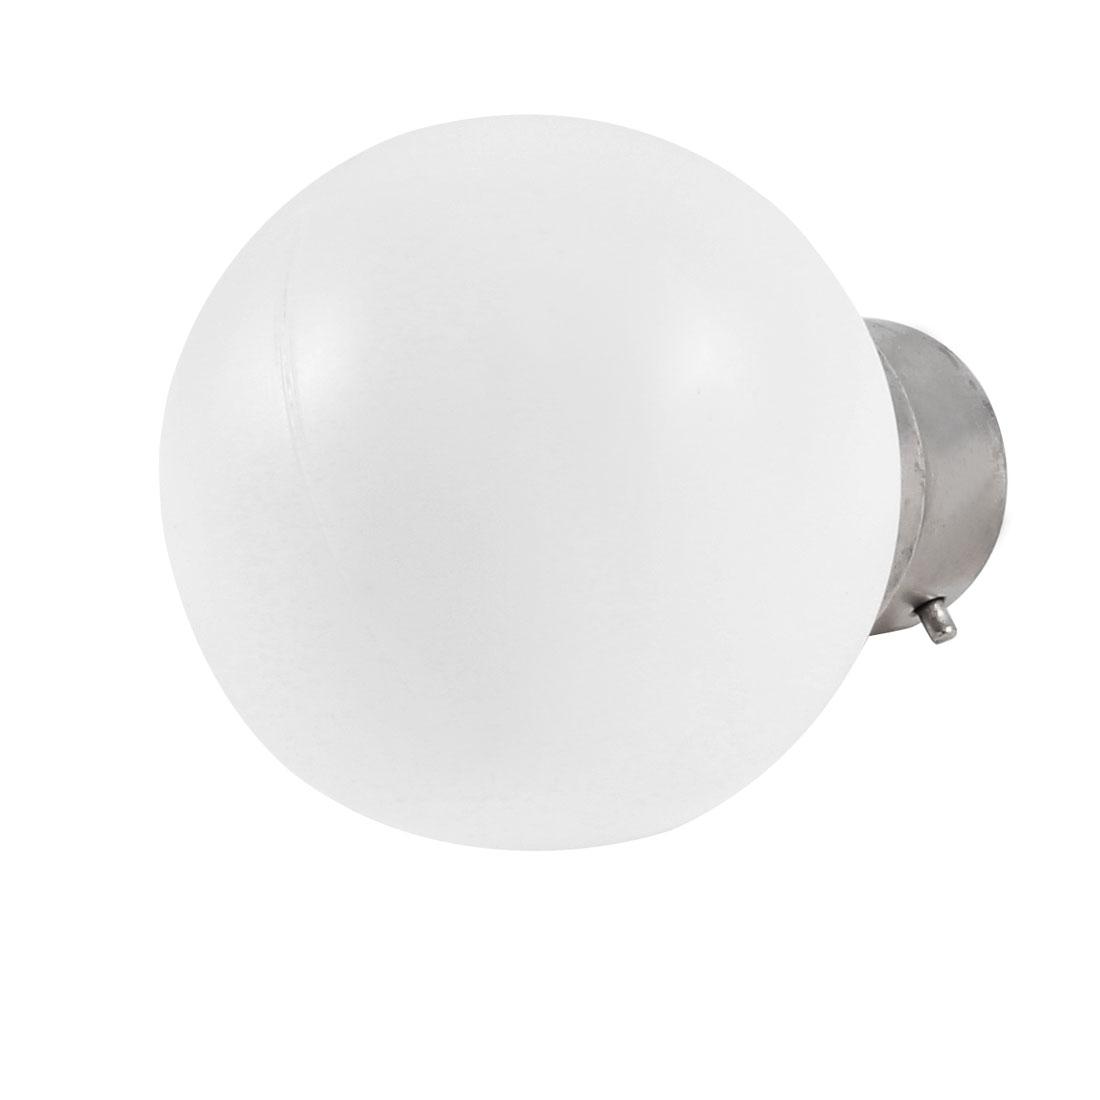 AC 160-250V 1W B22 Socket White LED Bulb Energy Saving Lamp